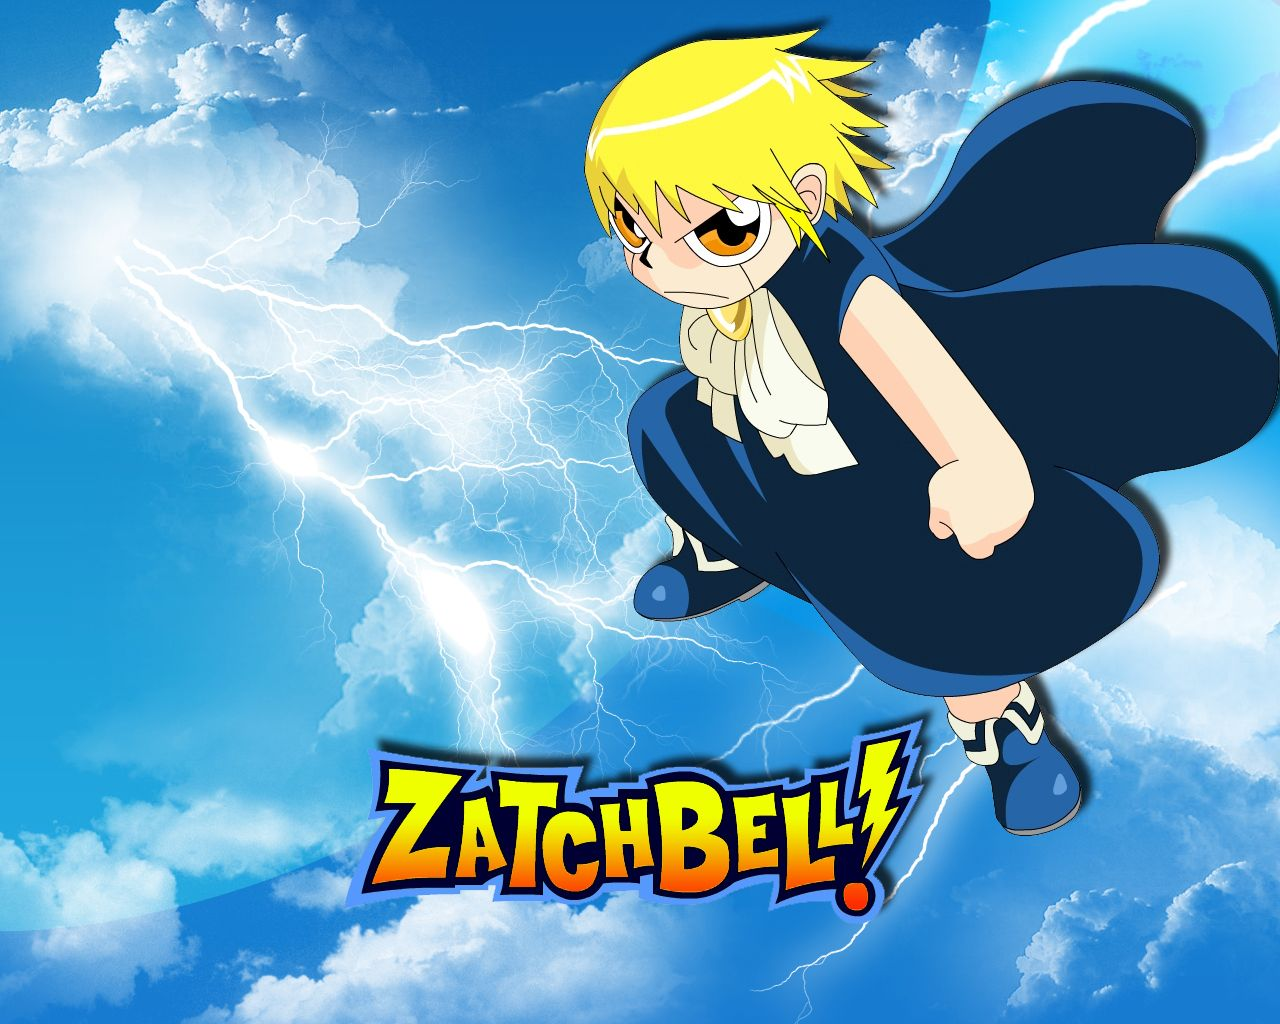 Zatch Bell In Hindi - 1280x1024 ...